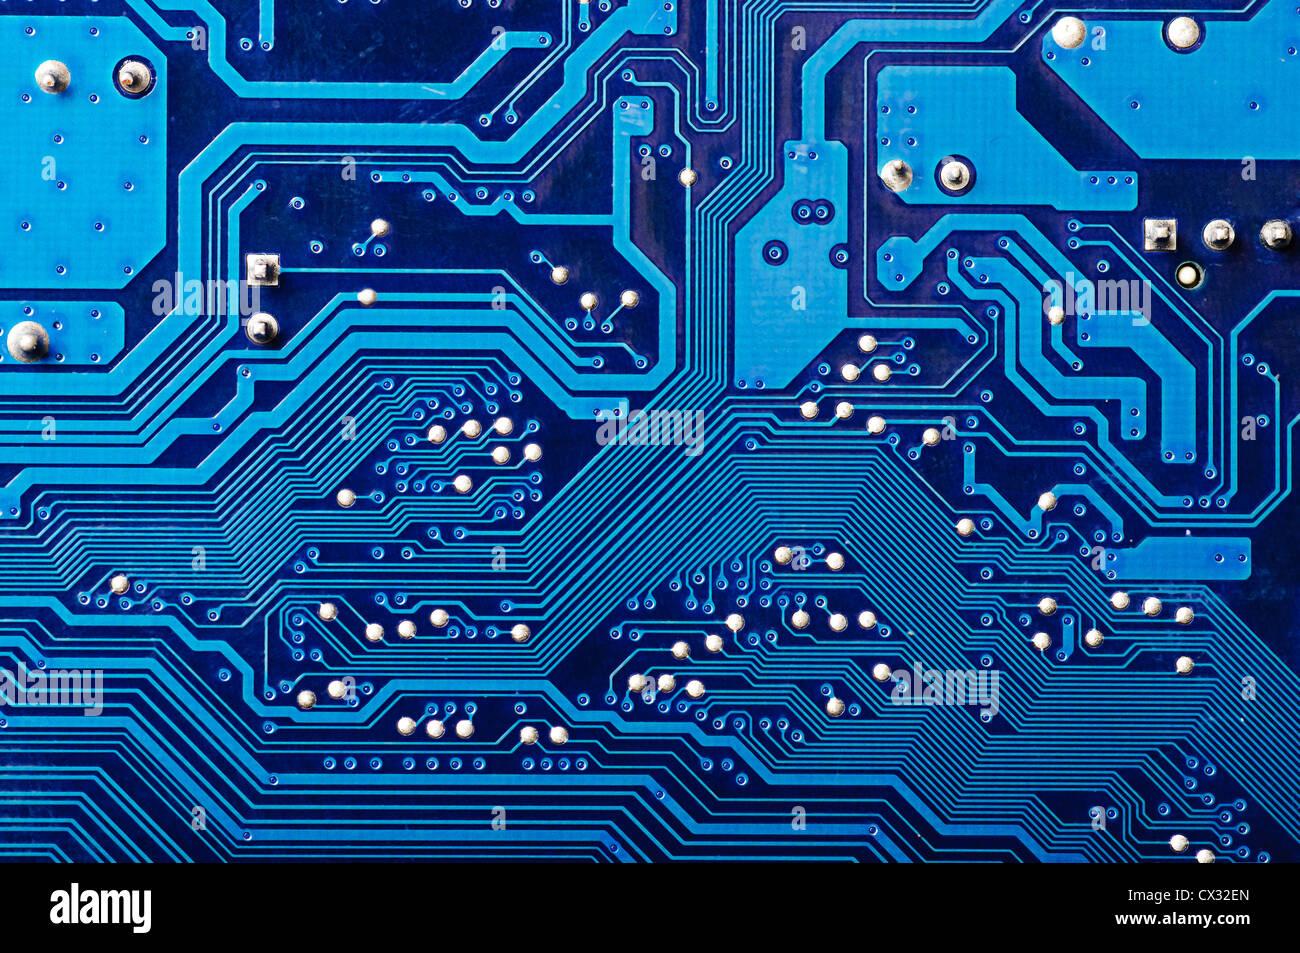 Motherboard Circuit Illustration: Blue Digital Circuit Board Background (pc Motherboard